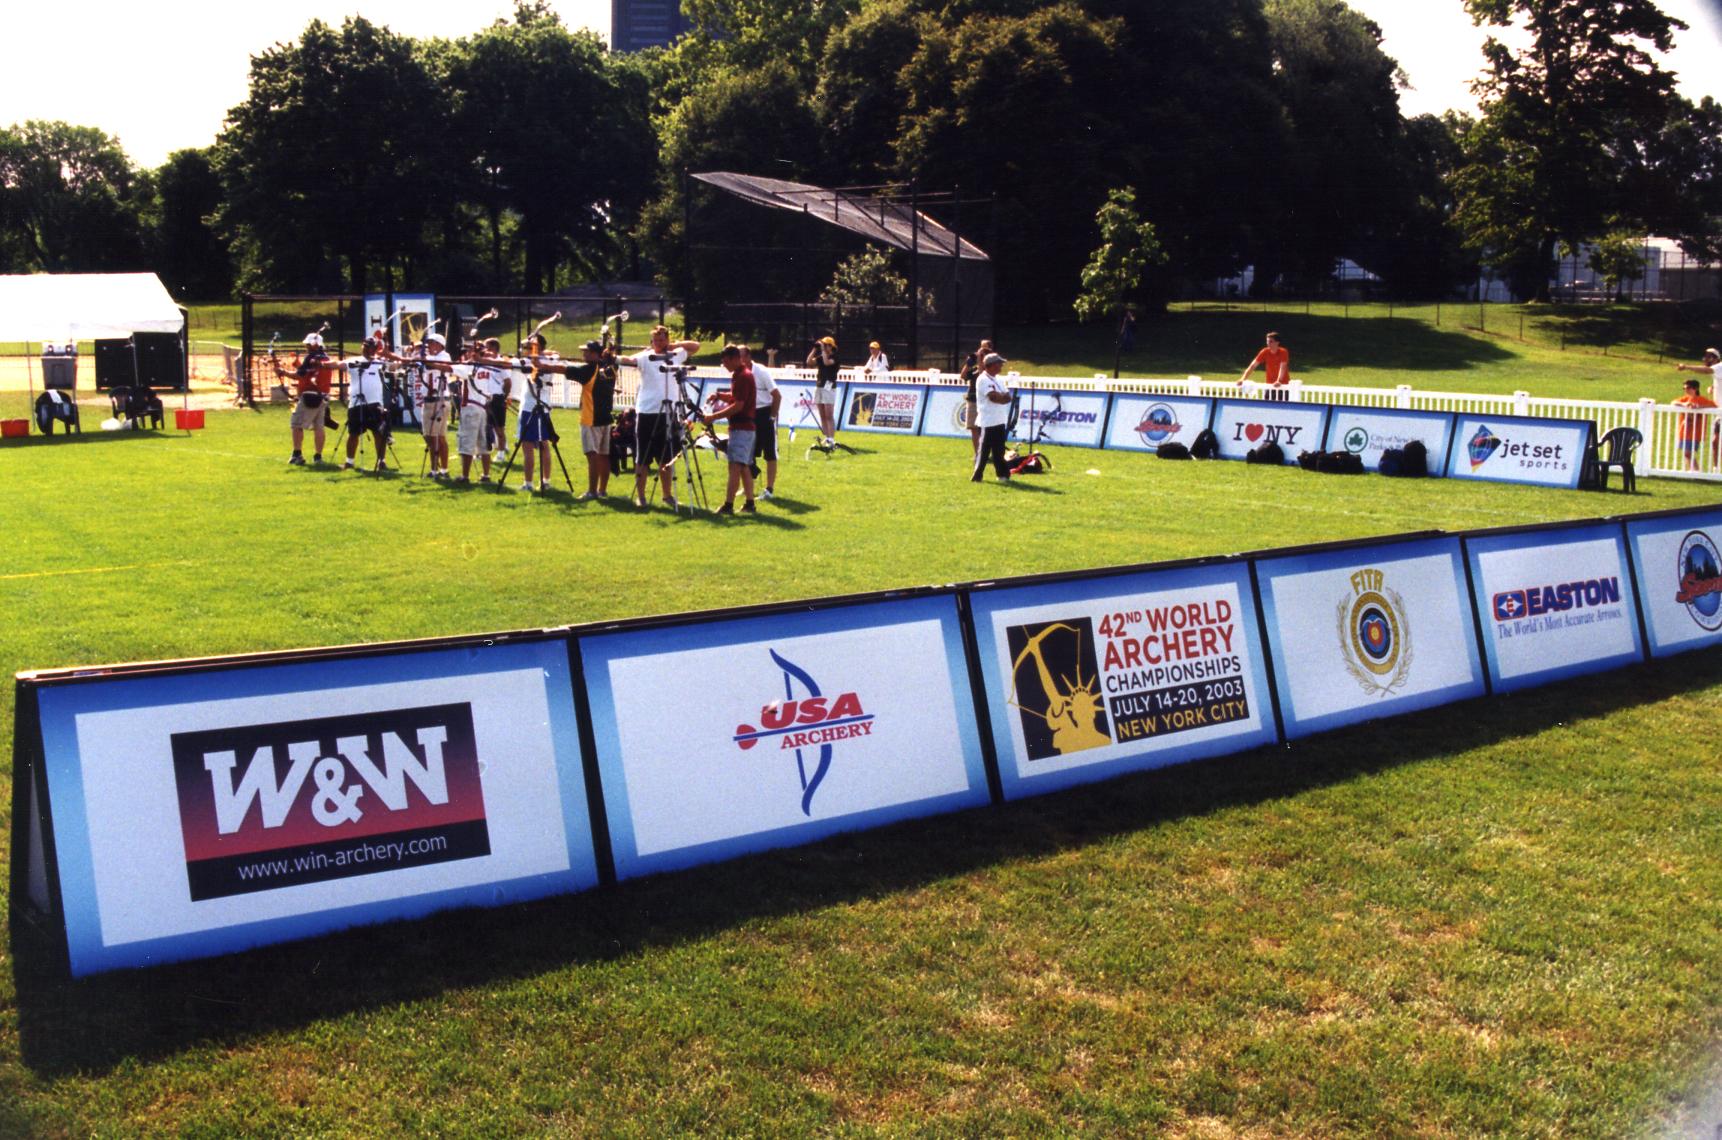 World Archery Championships